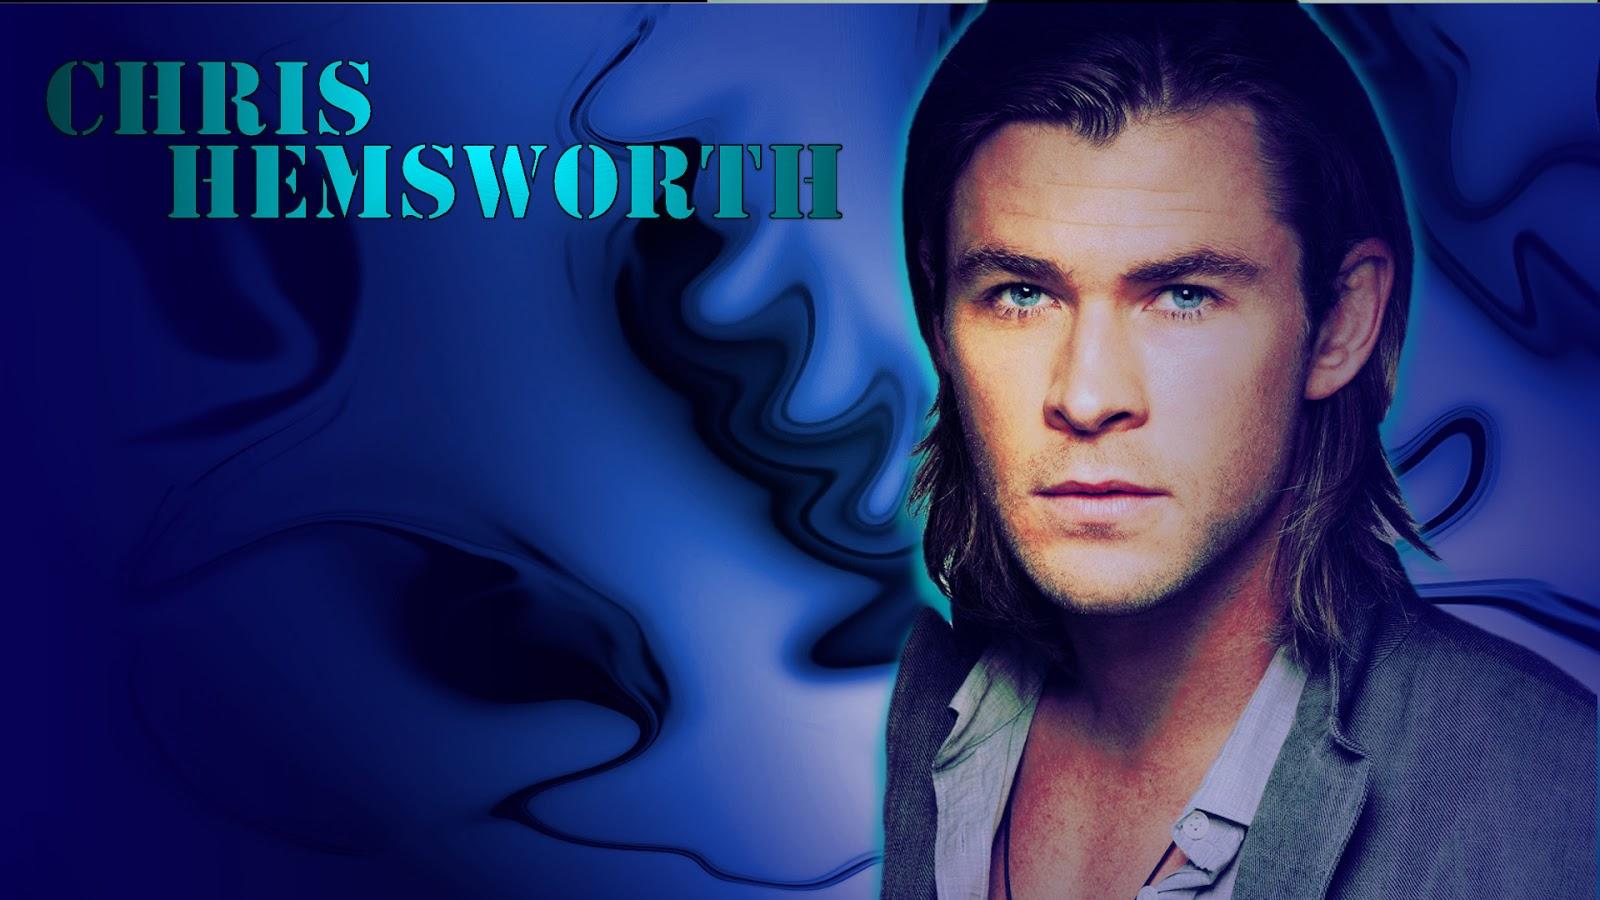 Chris Hemsworth hd Wallpapers 2013 Harry styles 2013 1600x900